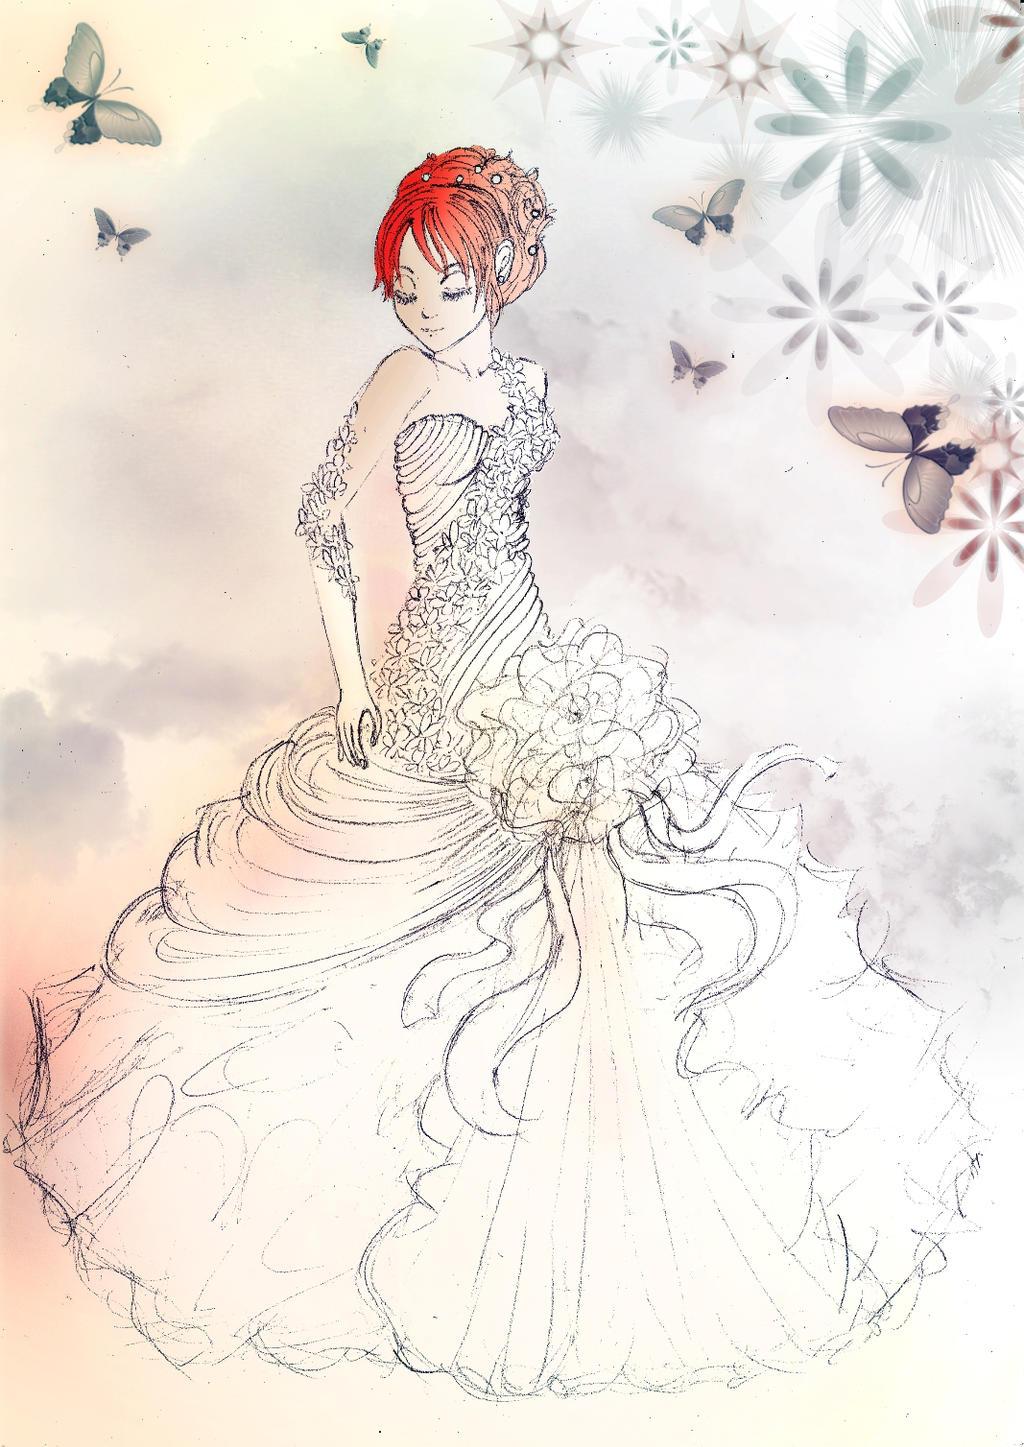 OP Wedding Dress By Cherryyy09 On DeviantArt - Anime Wedding Dress